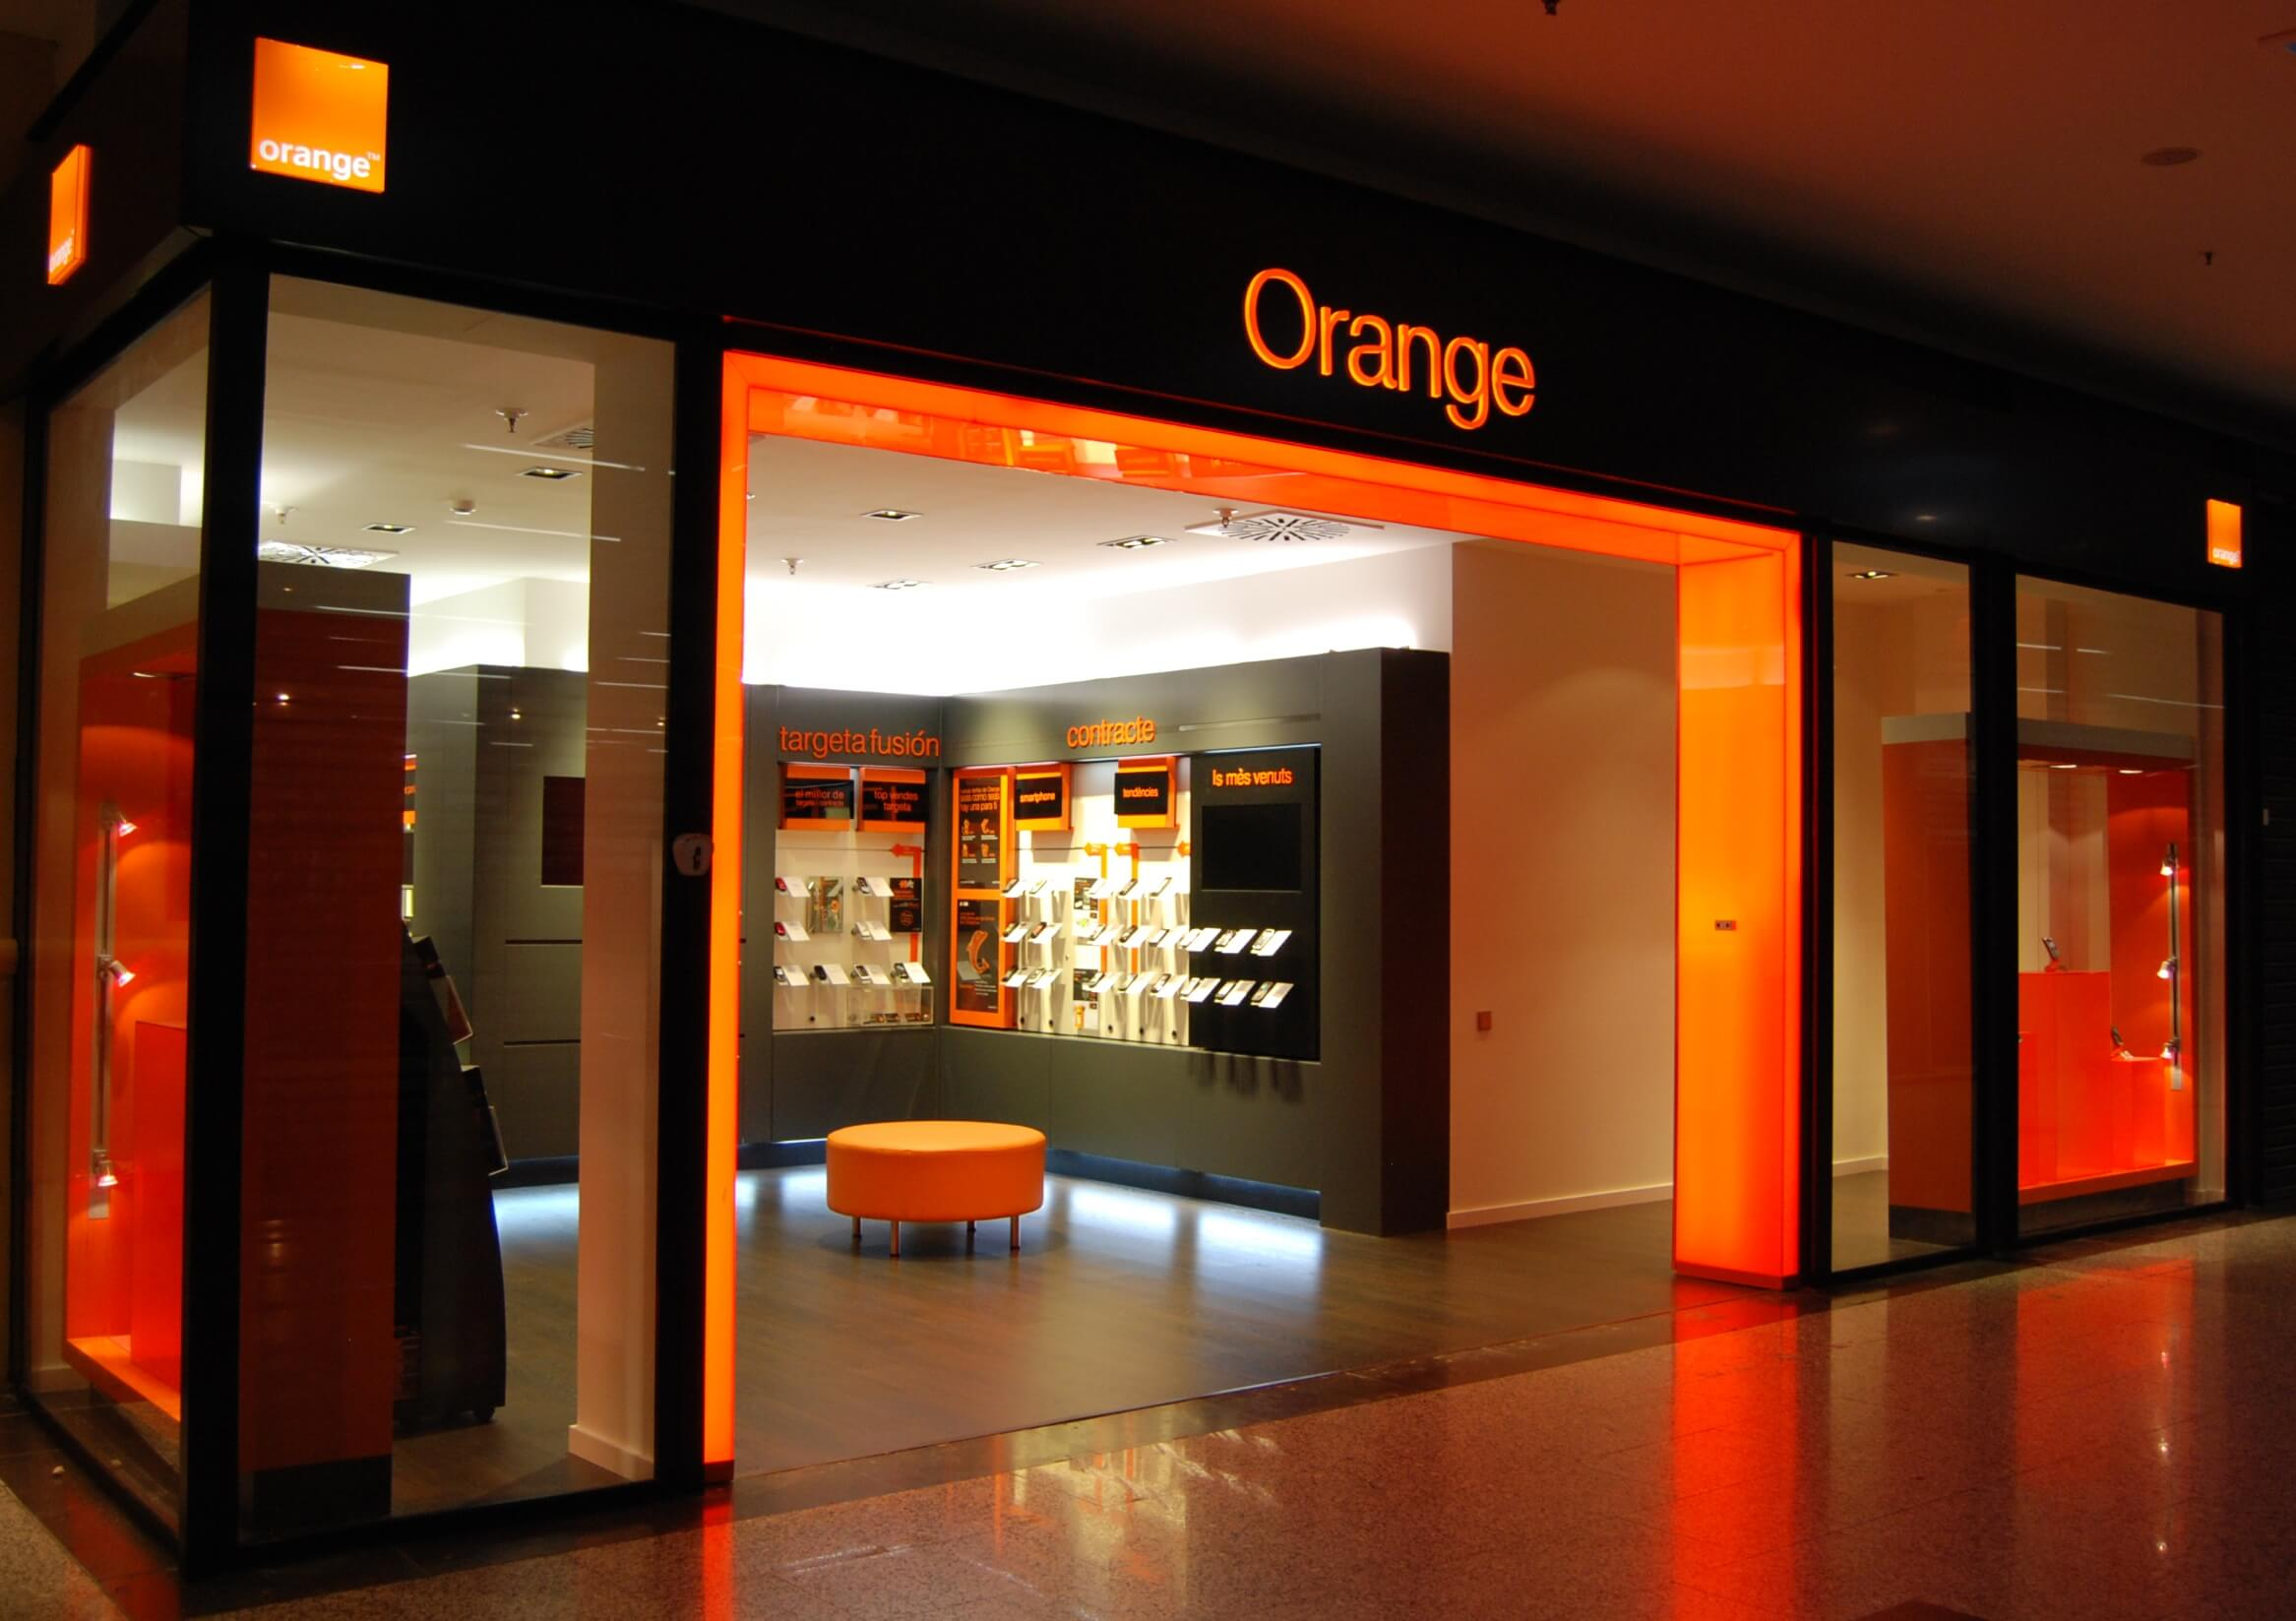 cómo renovar mi móvil con Orange